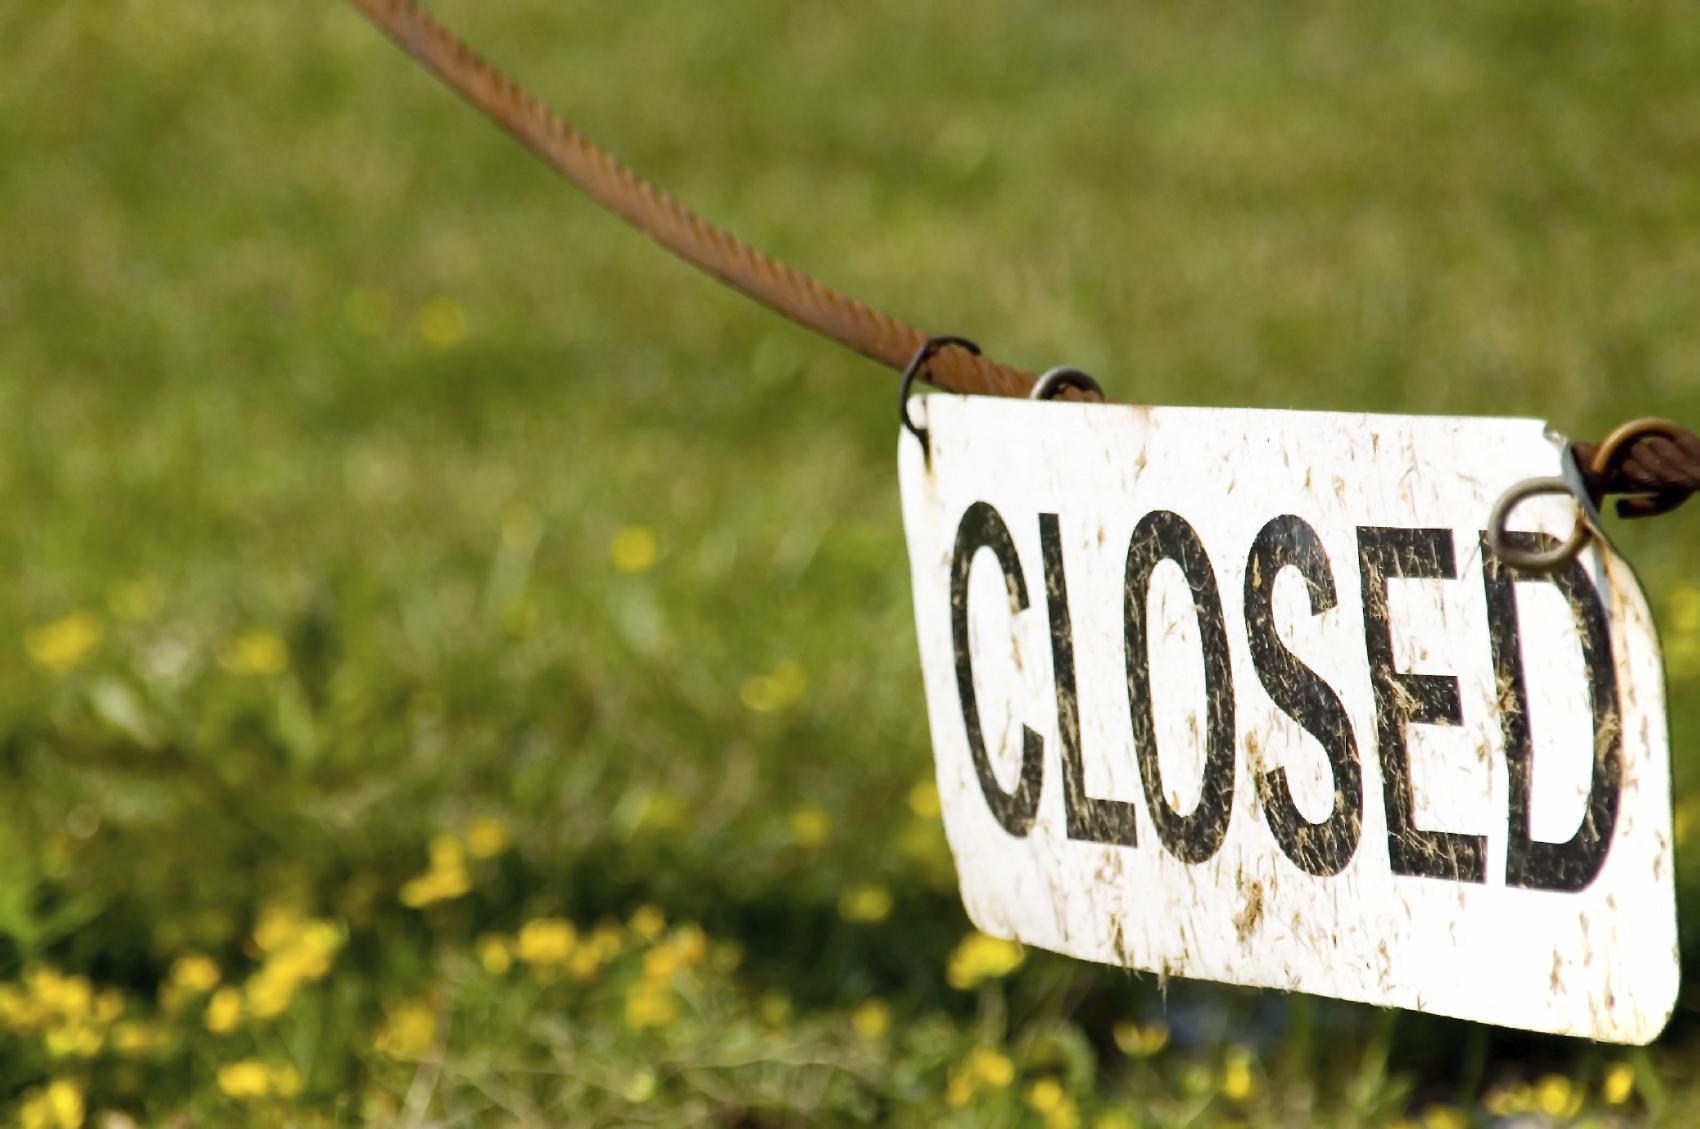 2013-10-02-Closed.iStock_000004087638_Medium.jpg